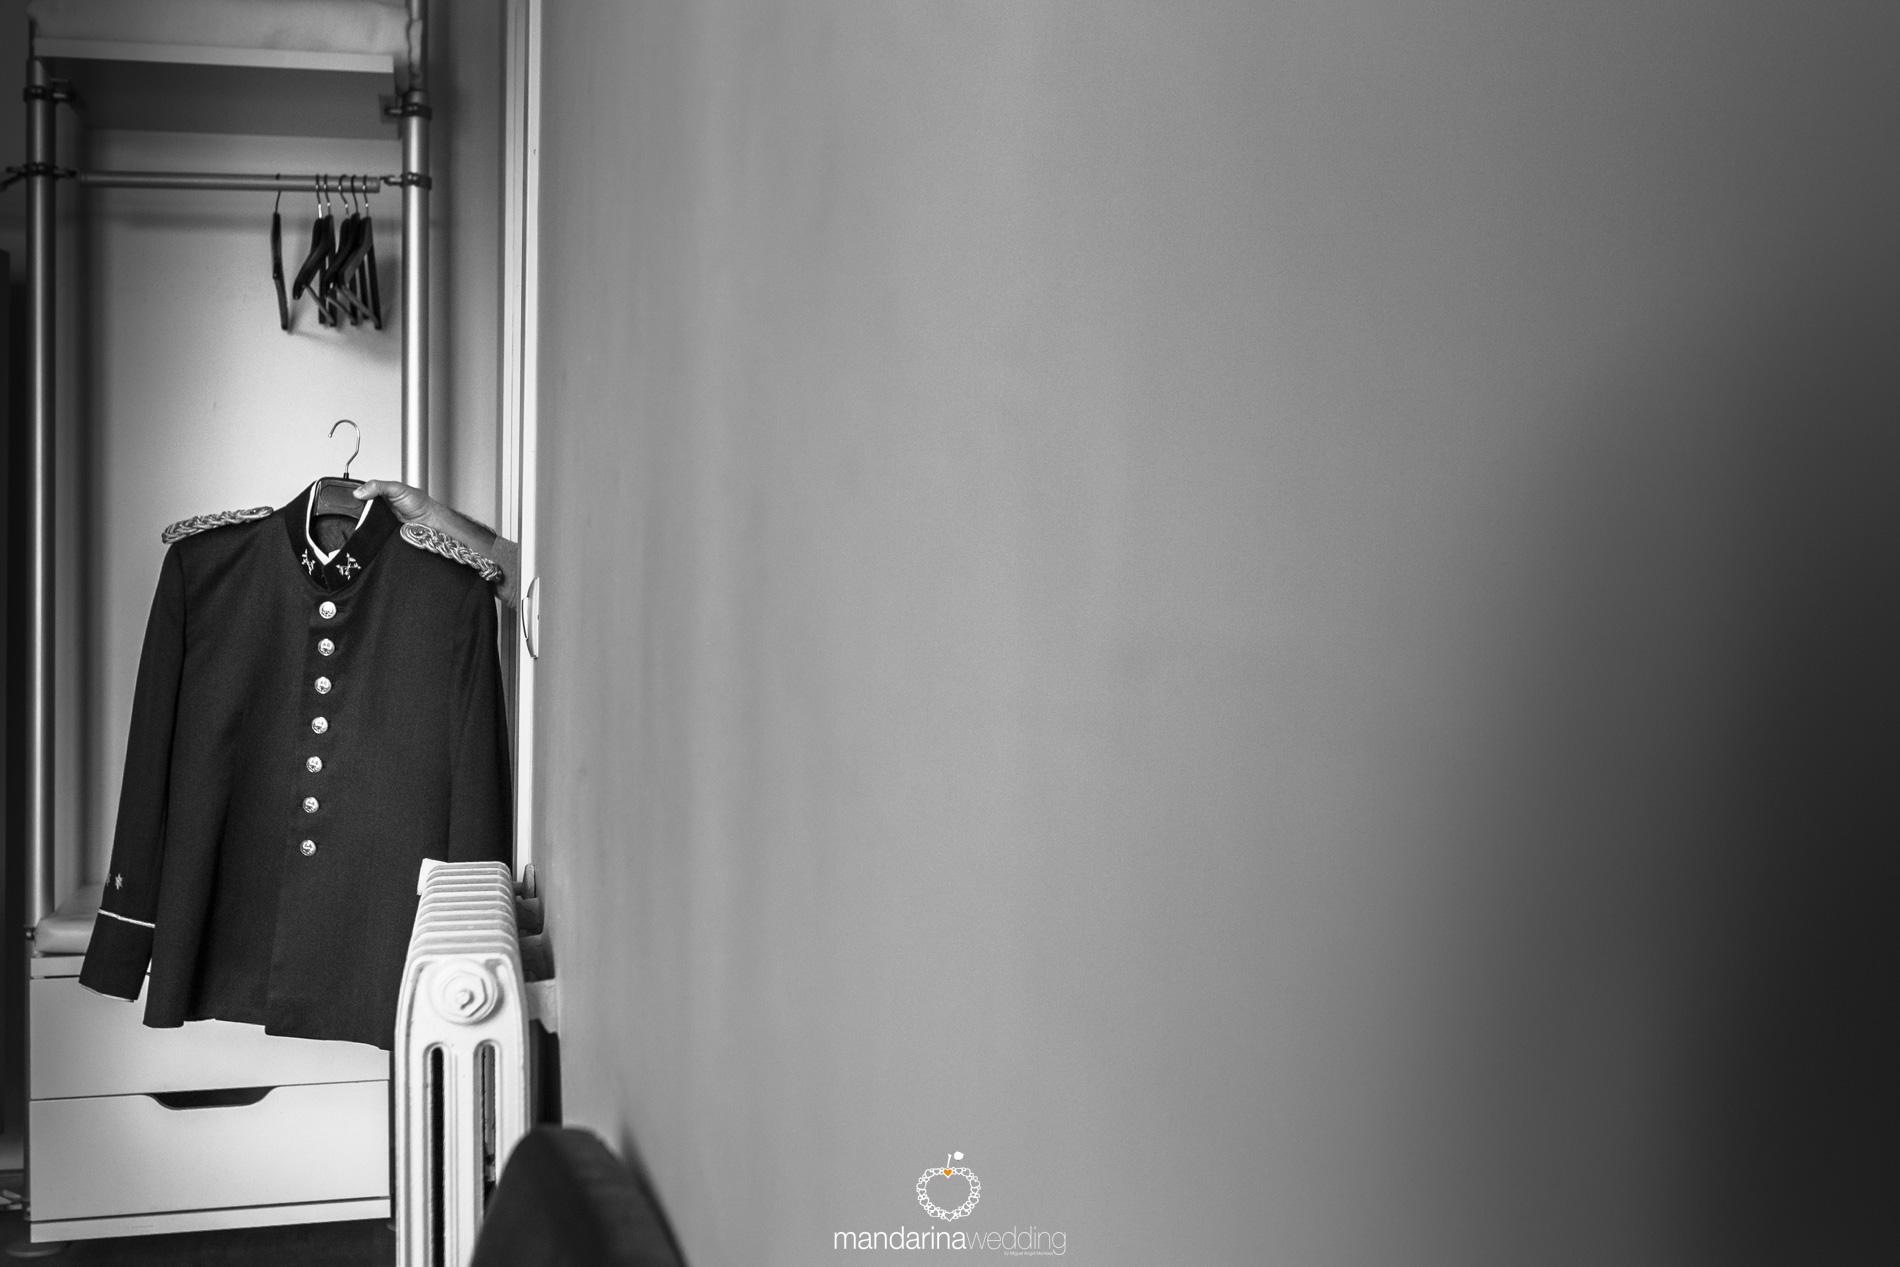 mandarina wedding, fotografos de boda, fotografo boda soria, fotografo boda barcelona, fotografo boda Madrid, fotógrafo boda lerida_12